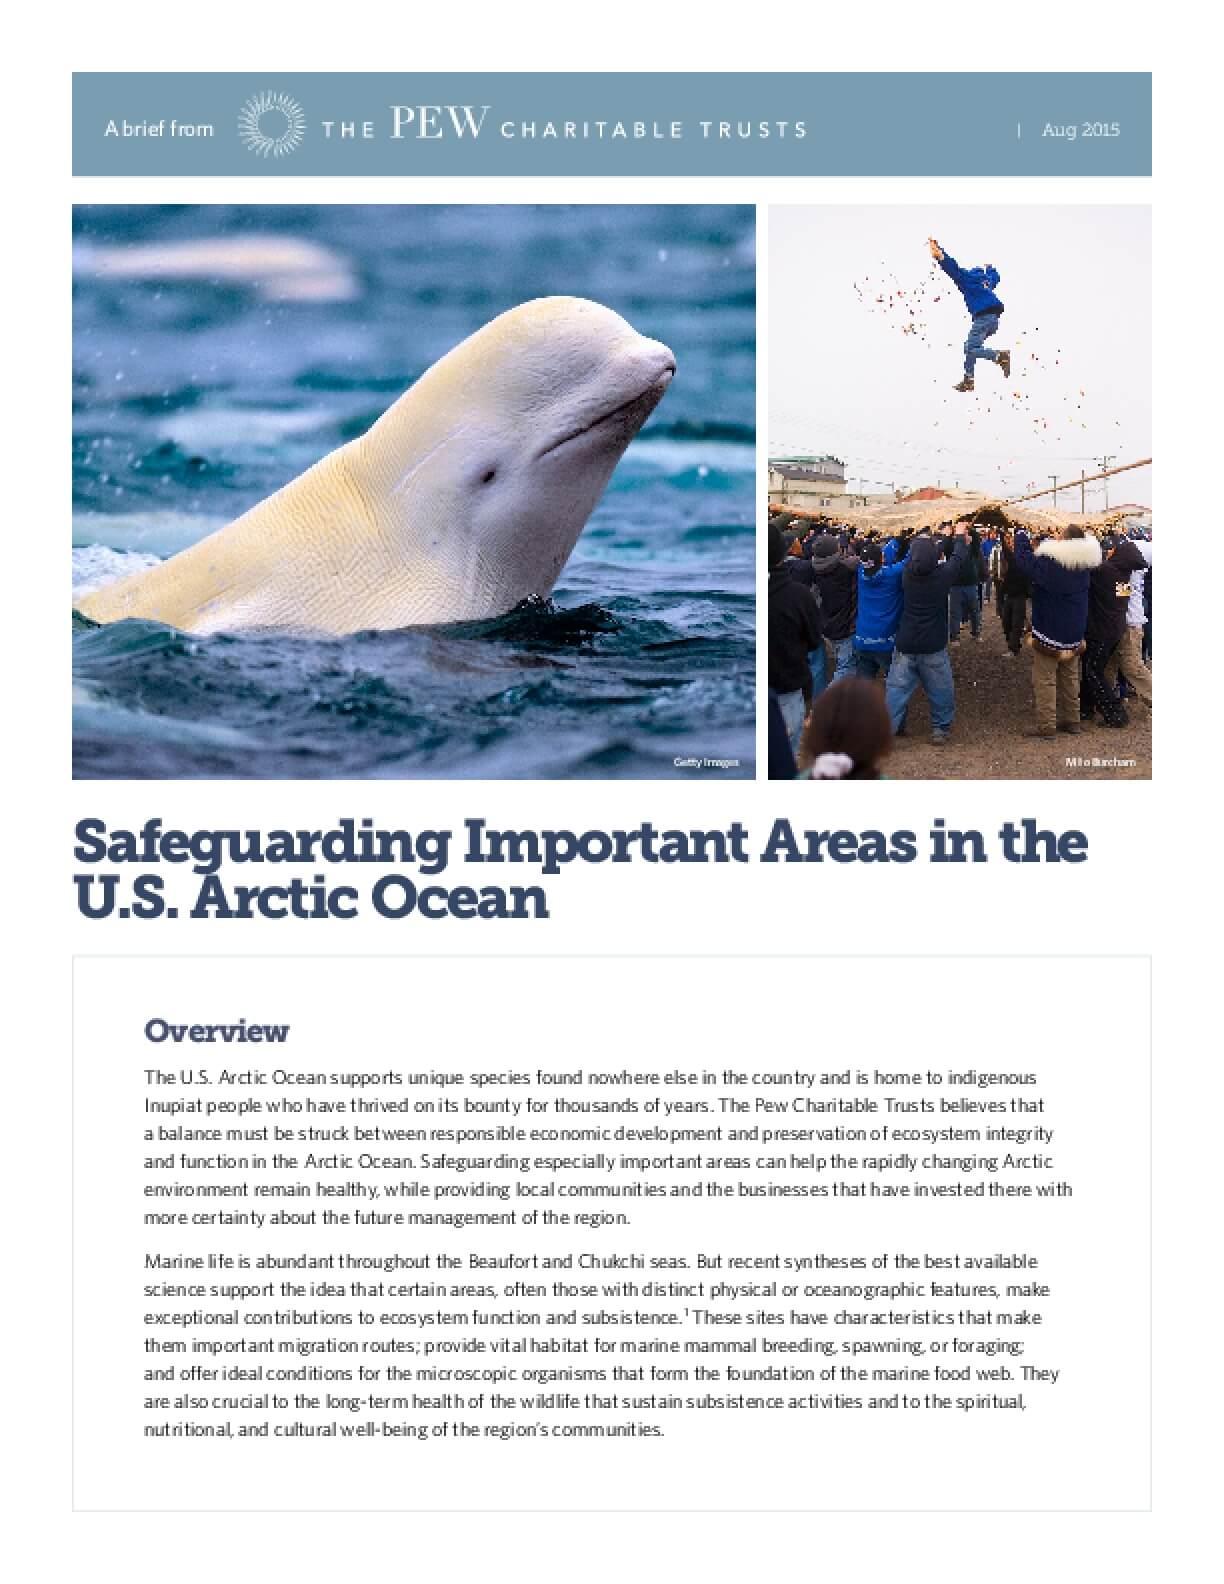 Safeguarding Important Areas in the U.S. Arctic Ocean